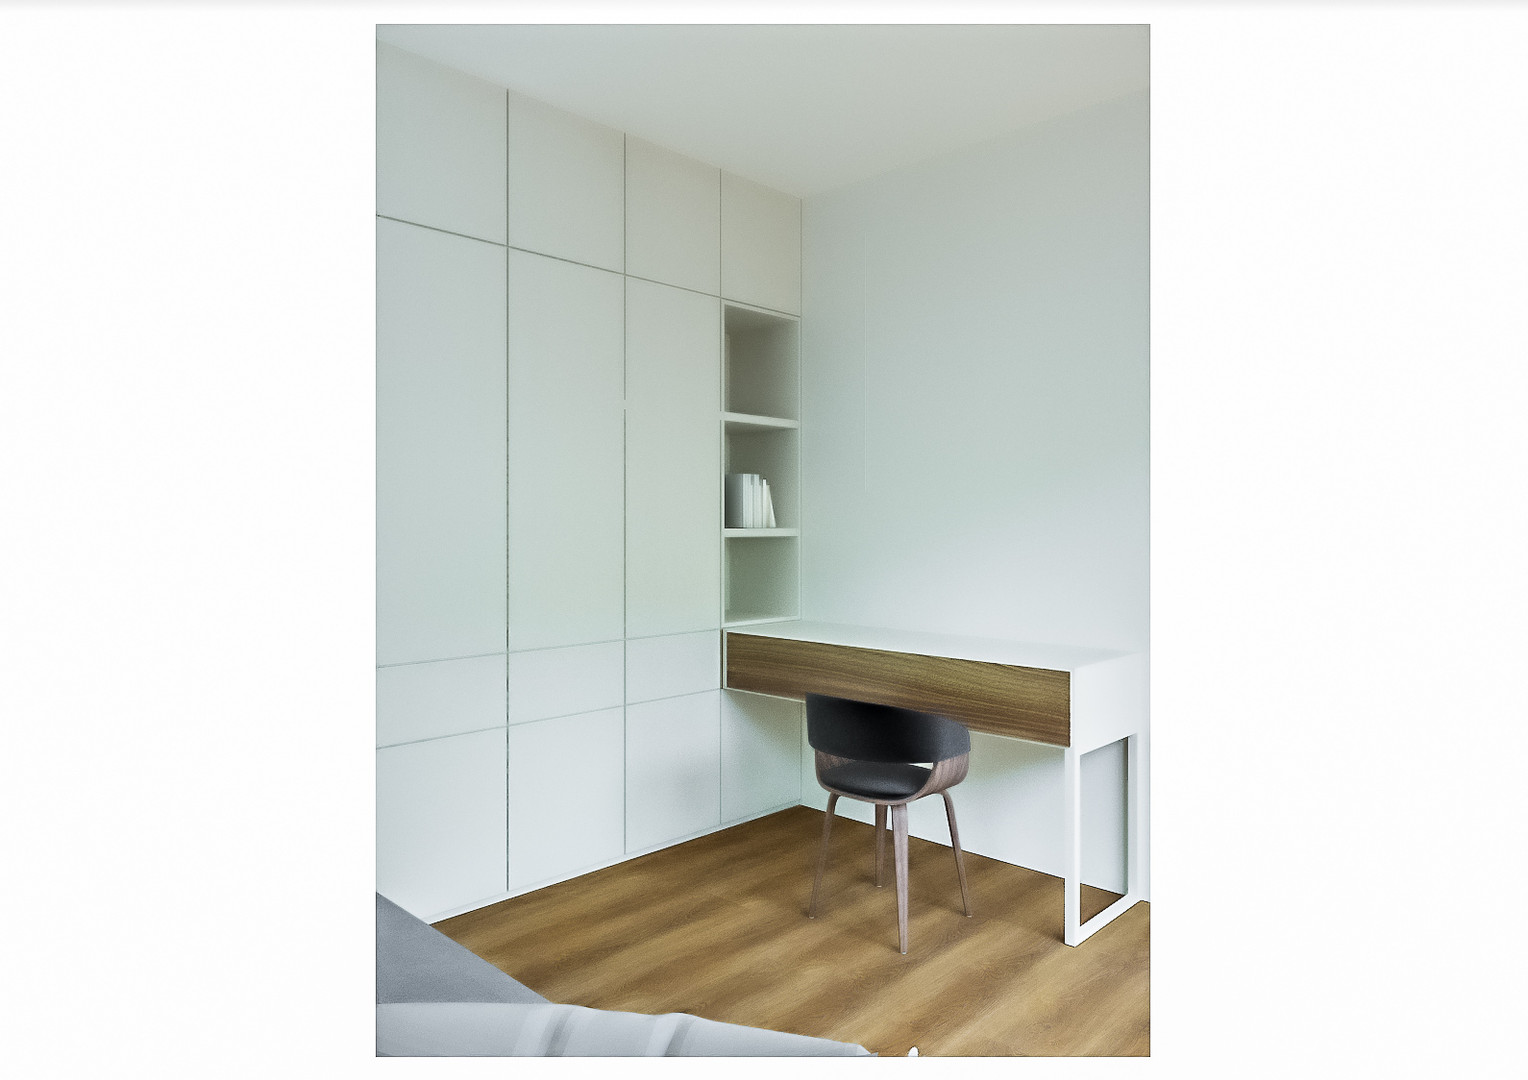 Poznan 3 bedroom for rent-7.jpg